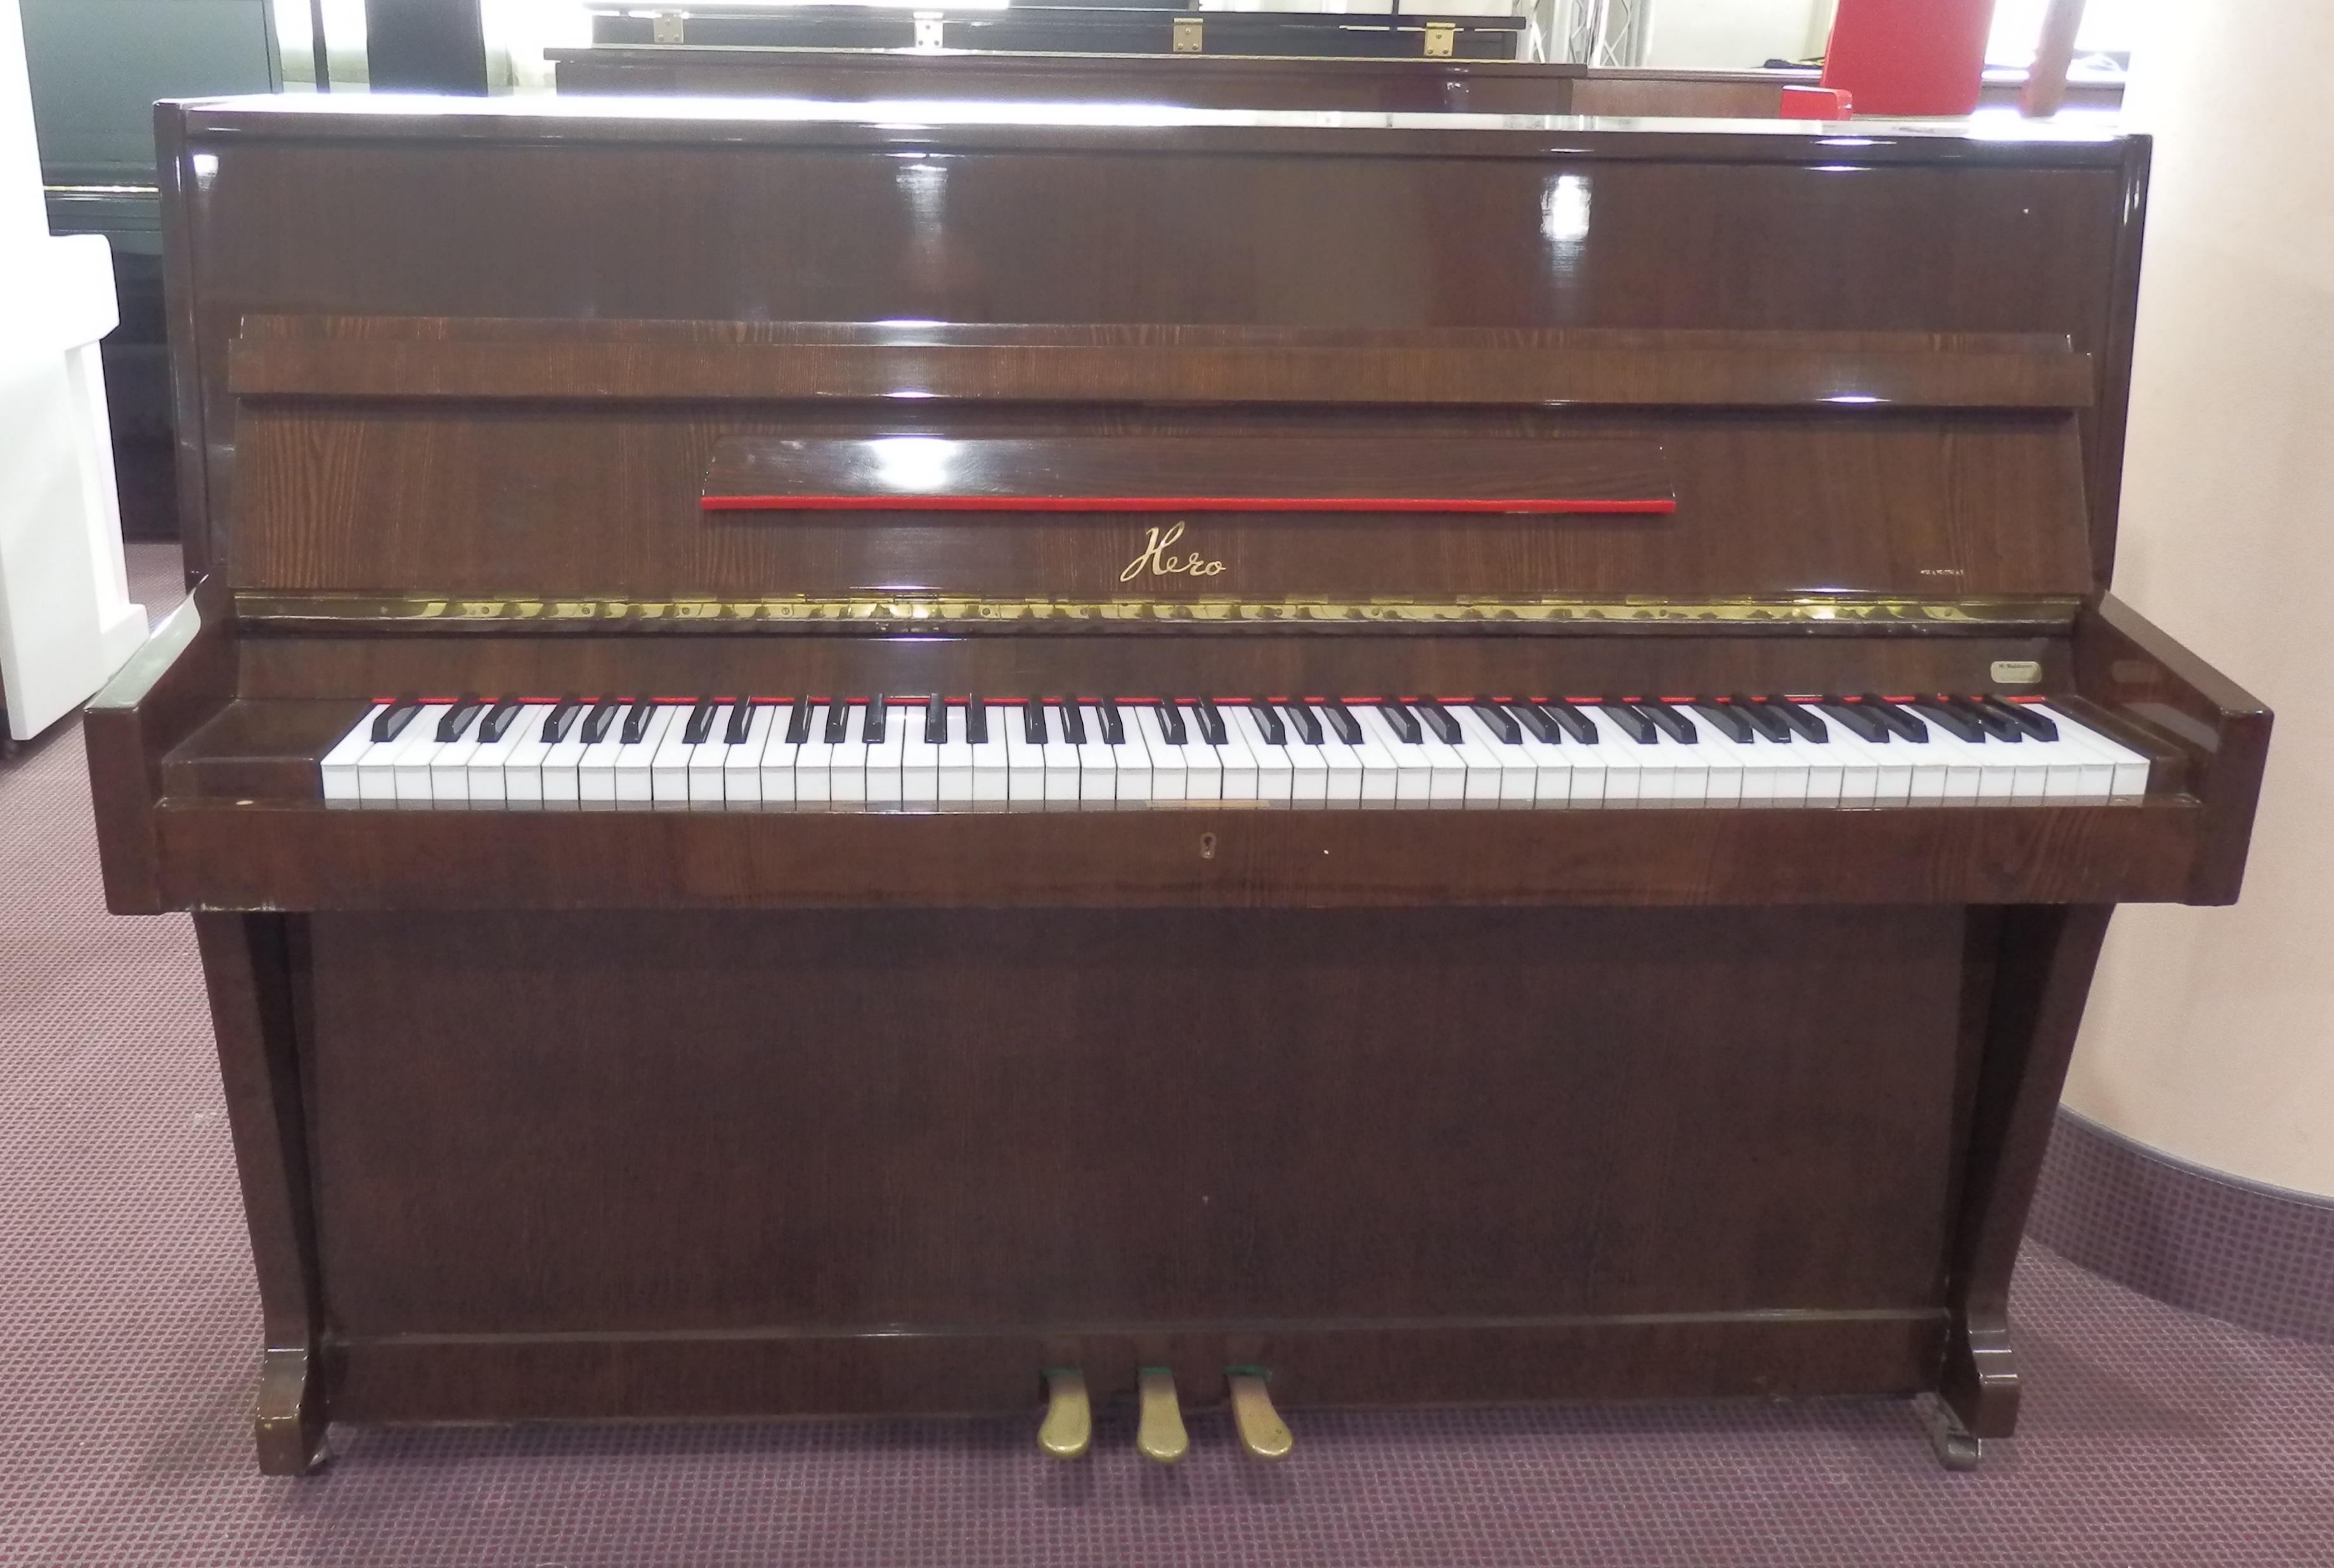 Pianoforte noce 108 usato hero strumenti musicali marino baldacci